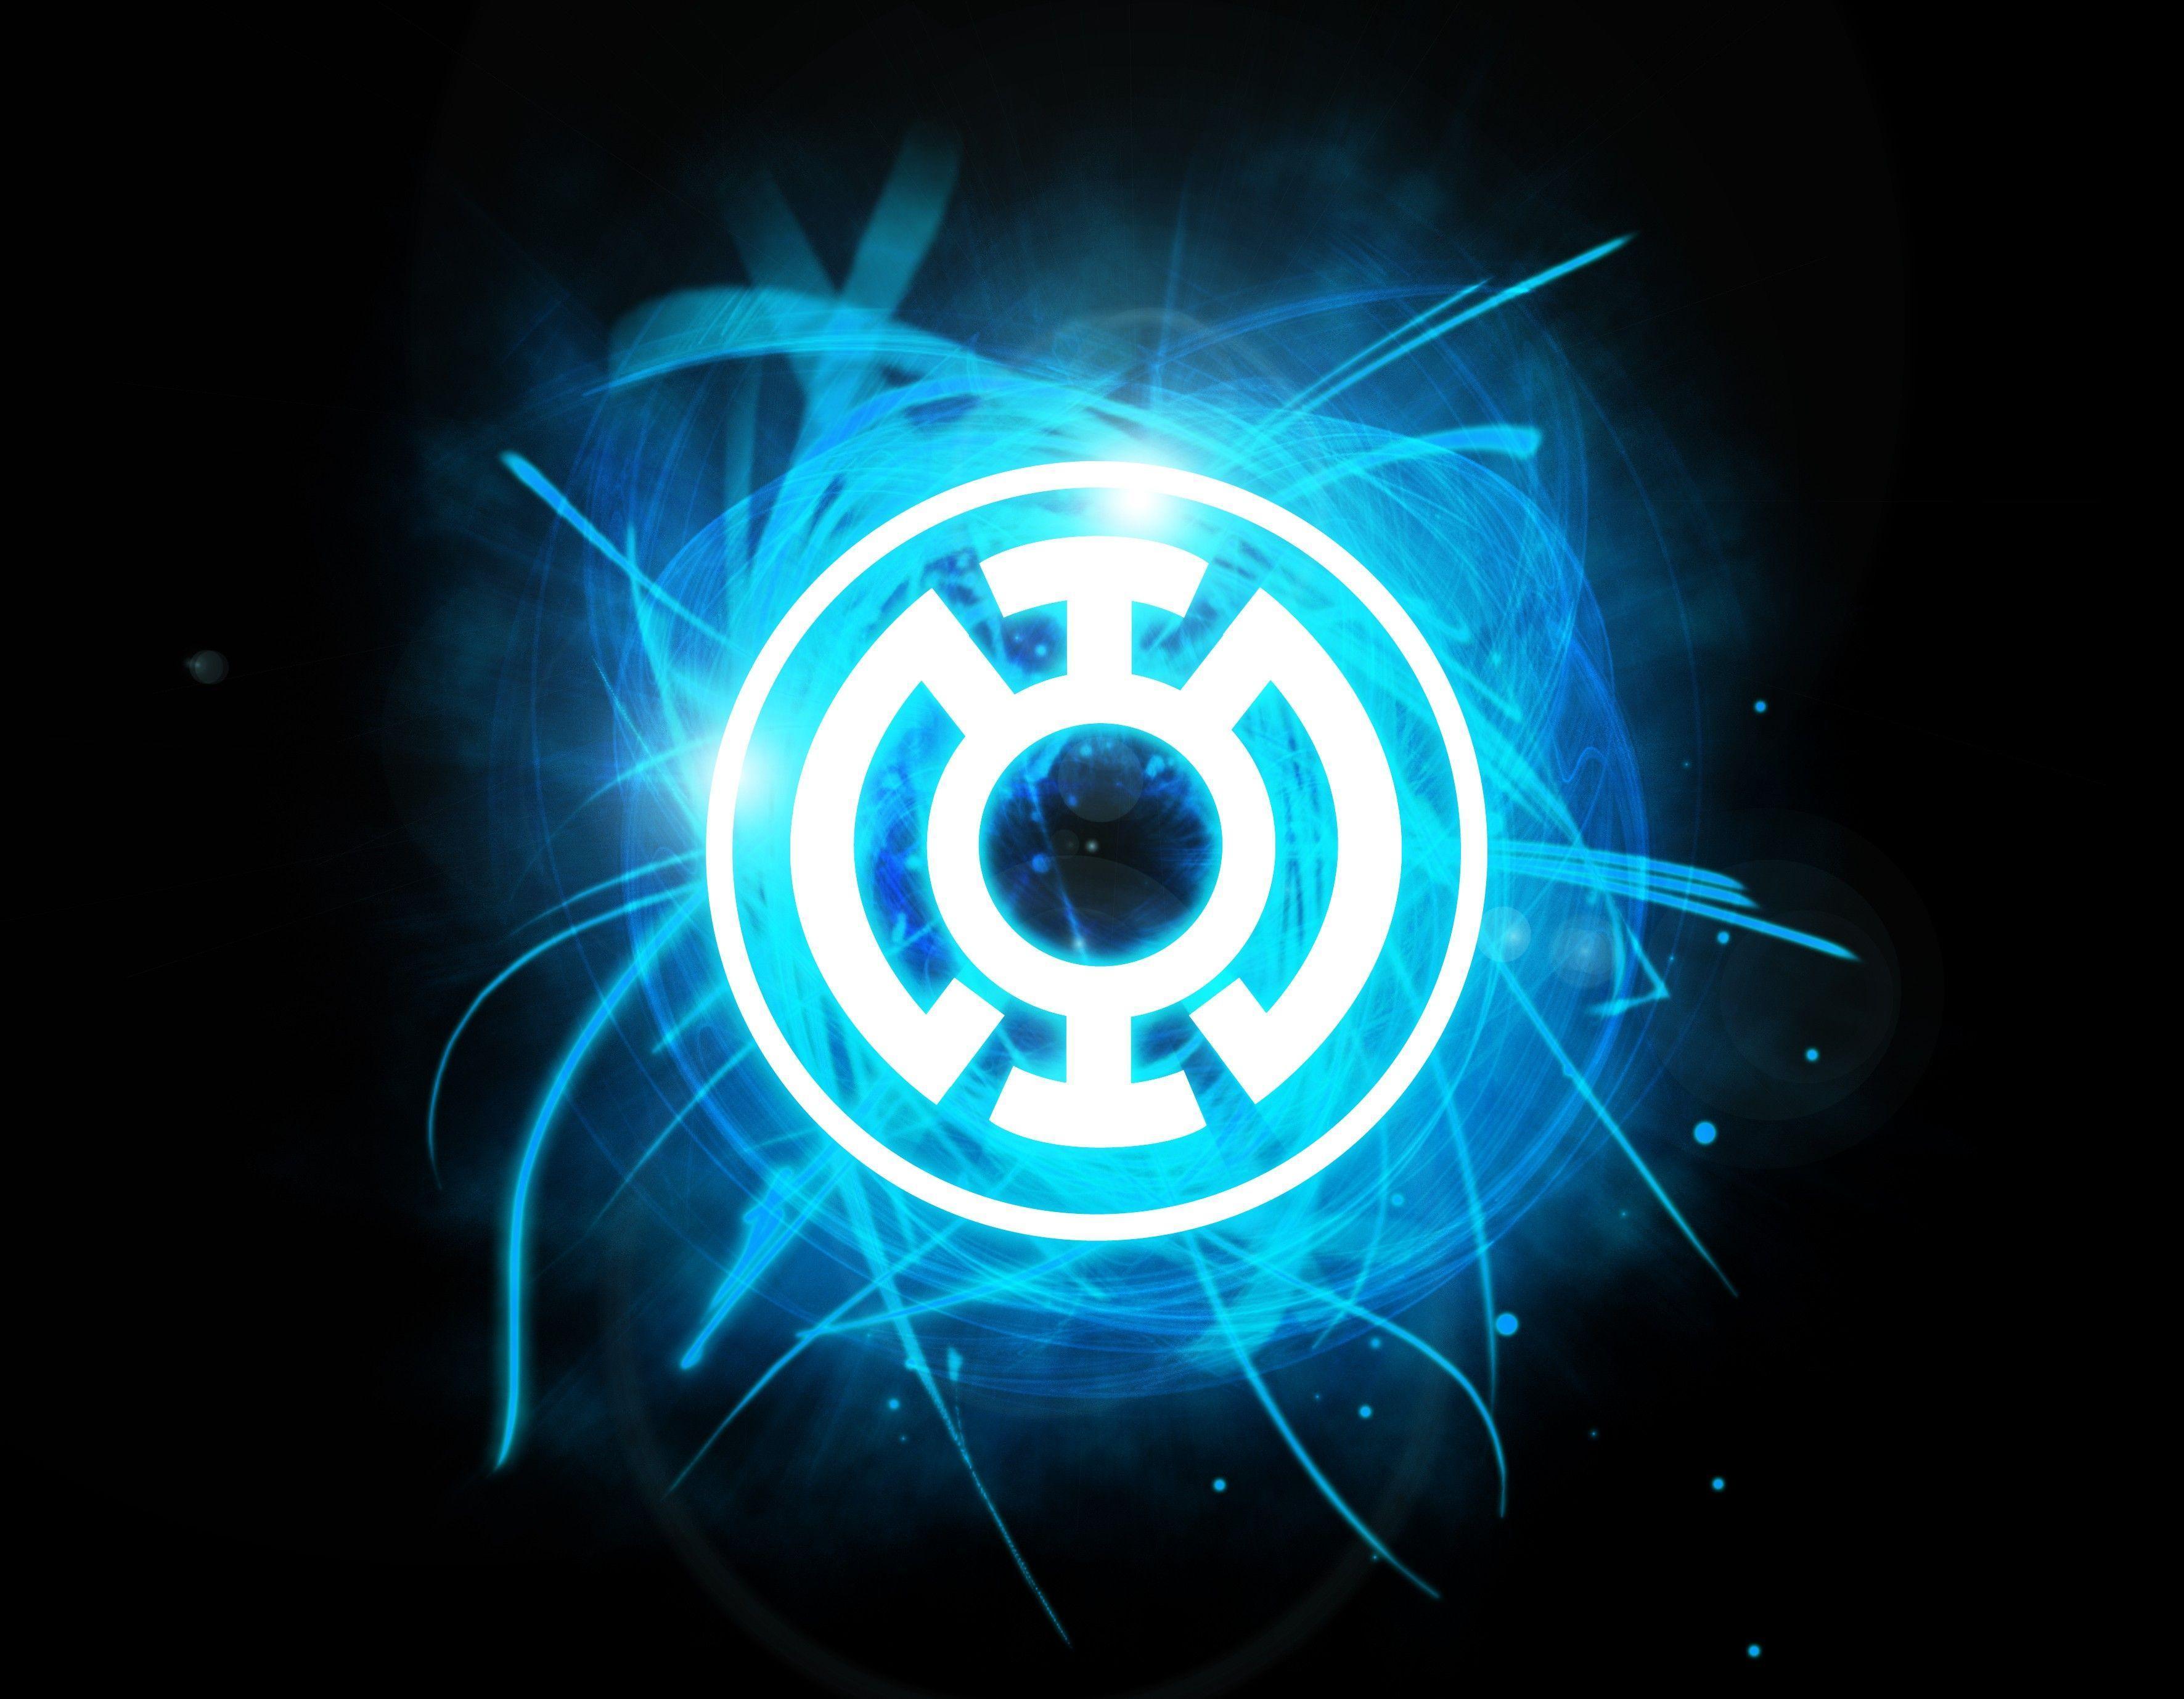 Blue Lantern Wallpapers 3543x2756